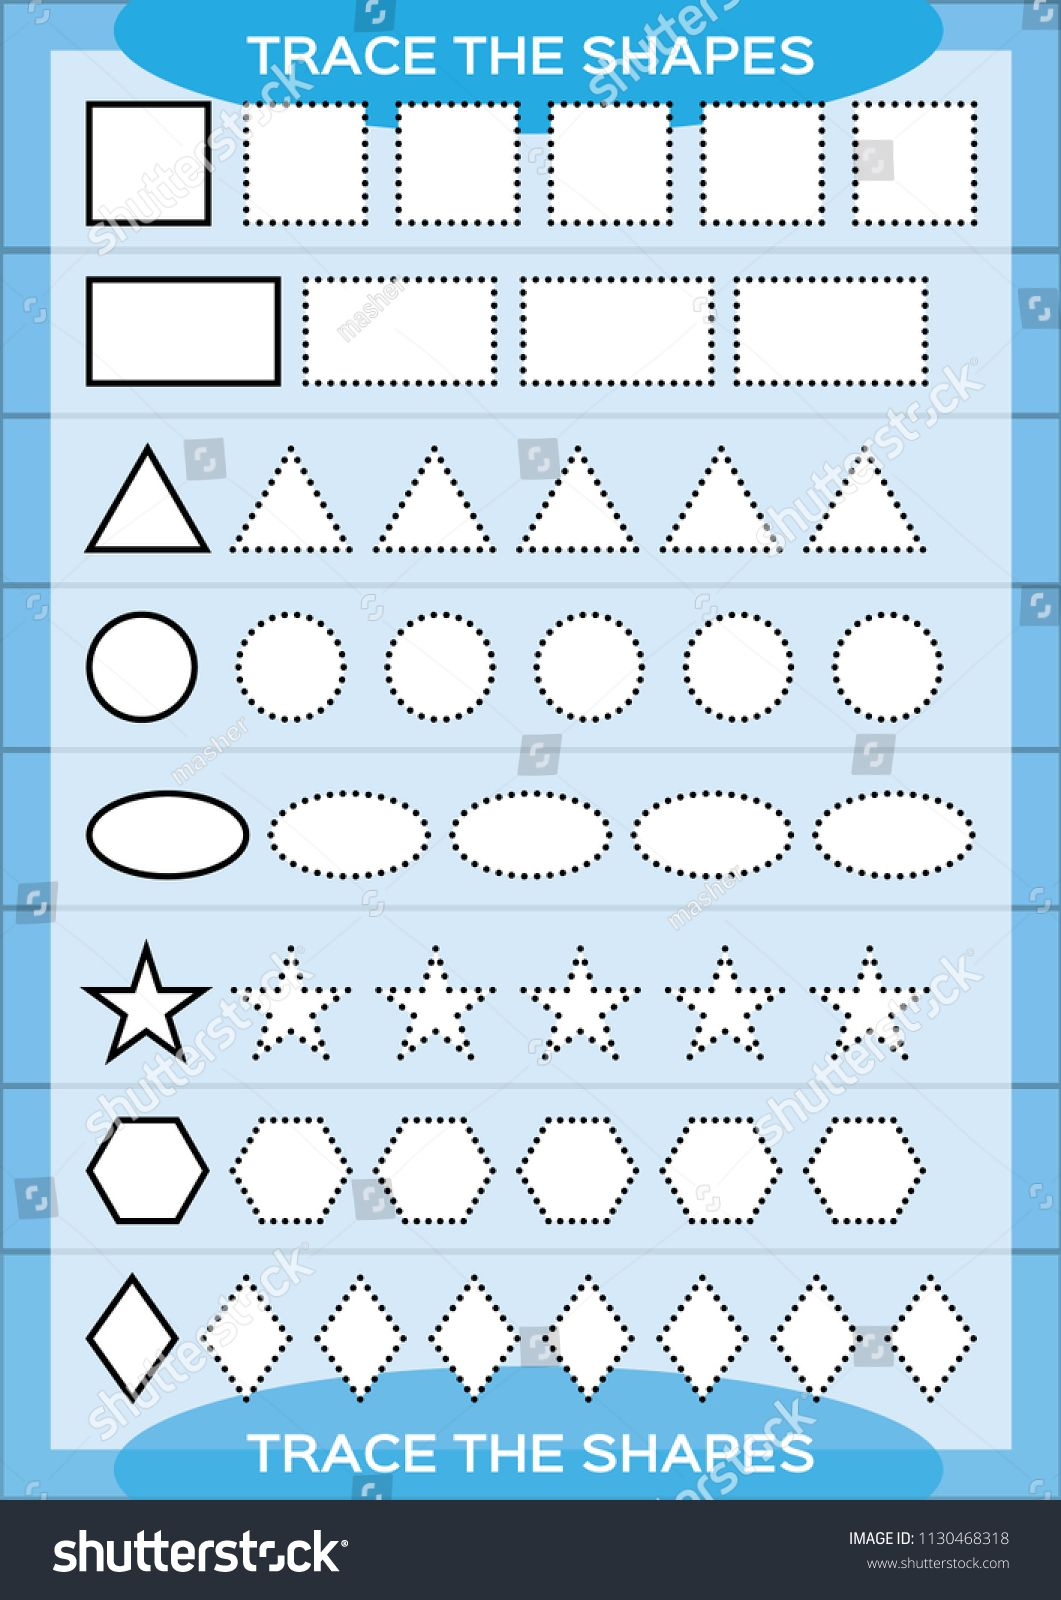 Trace The Shapes Kids Education Preschool Worksheet